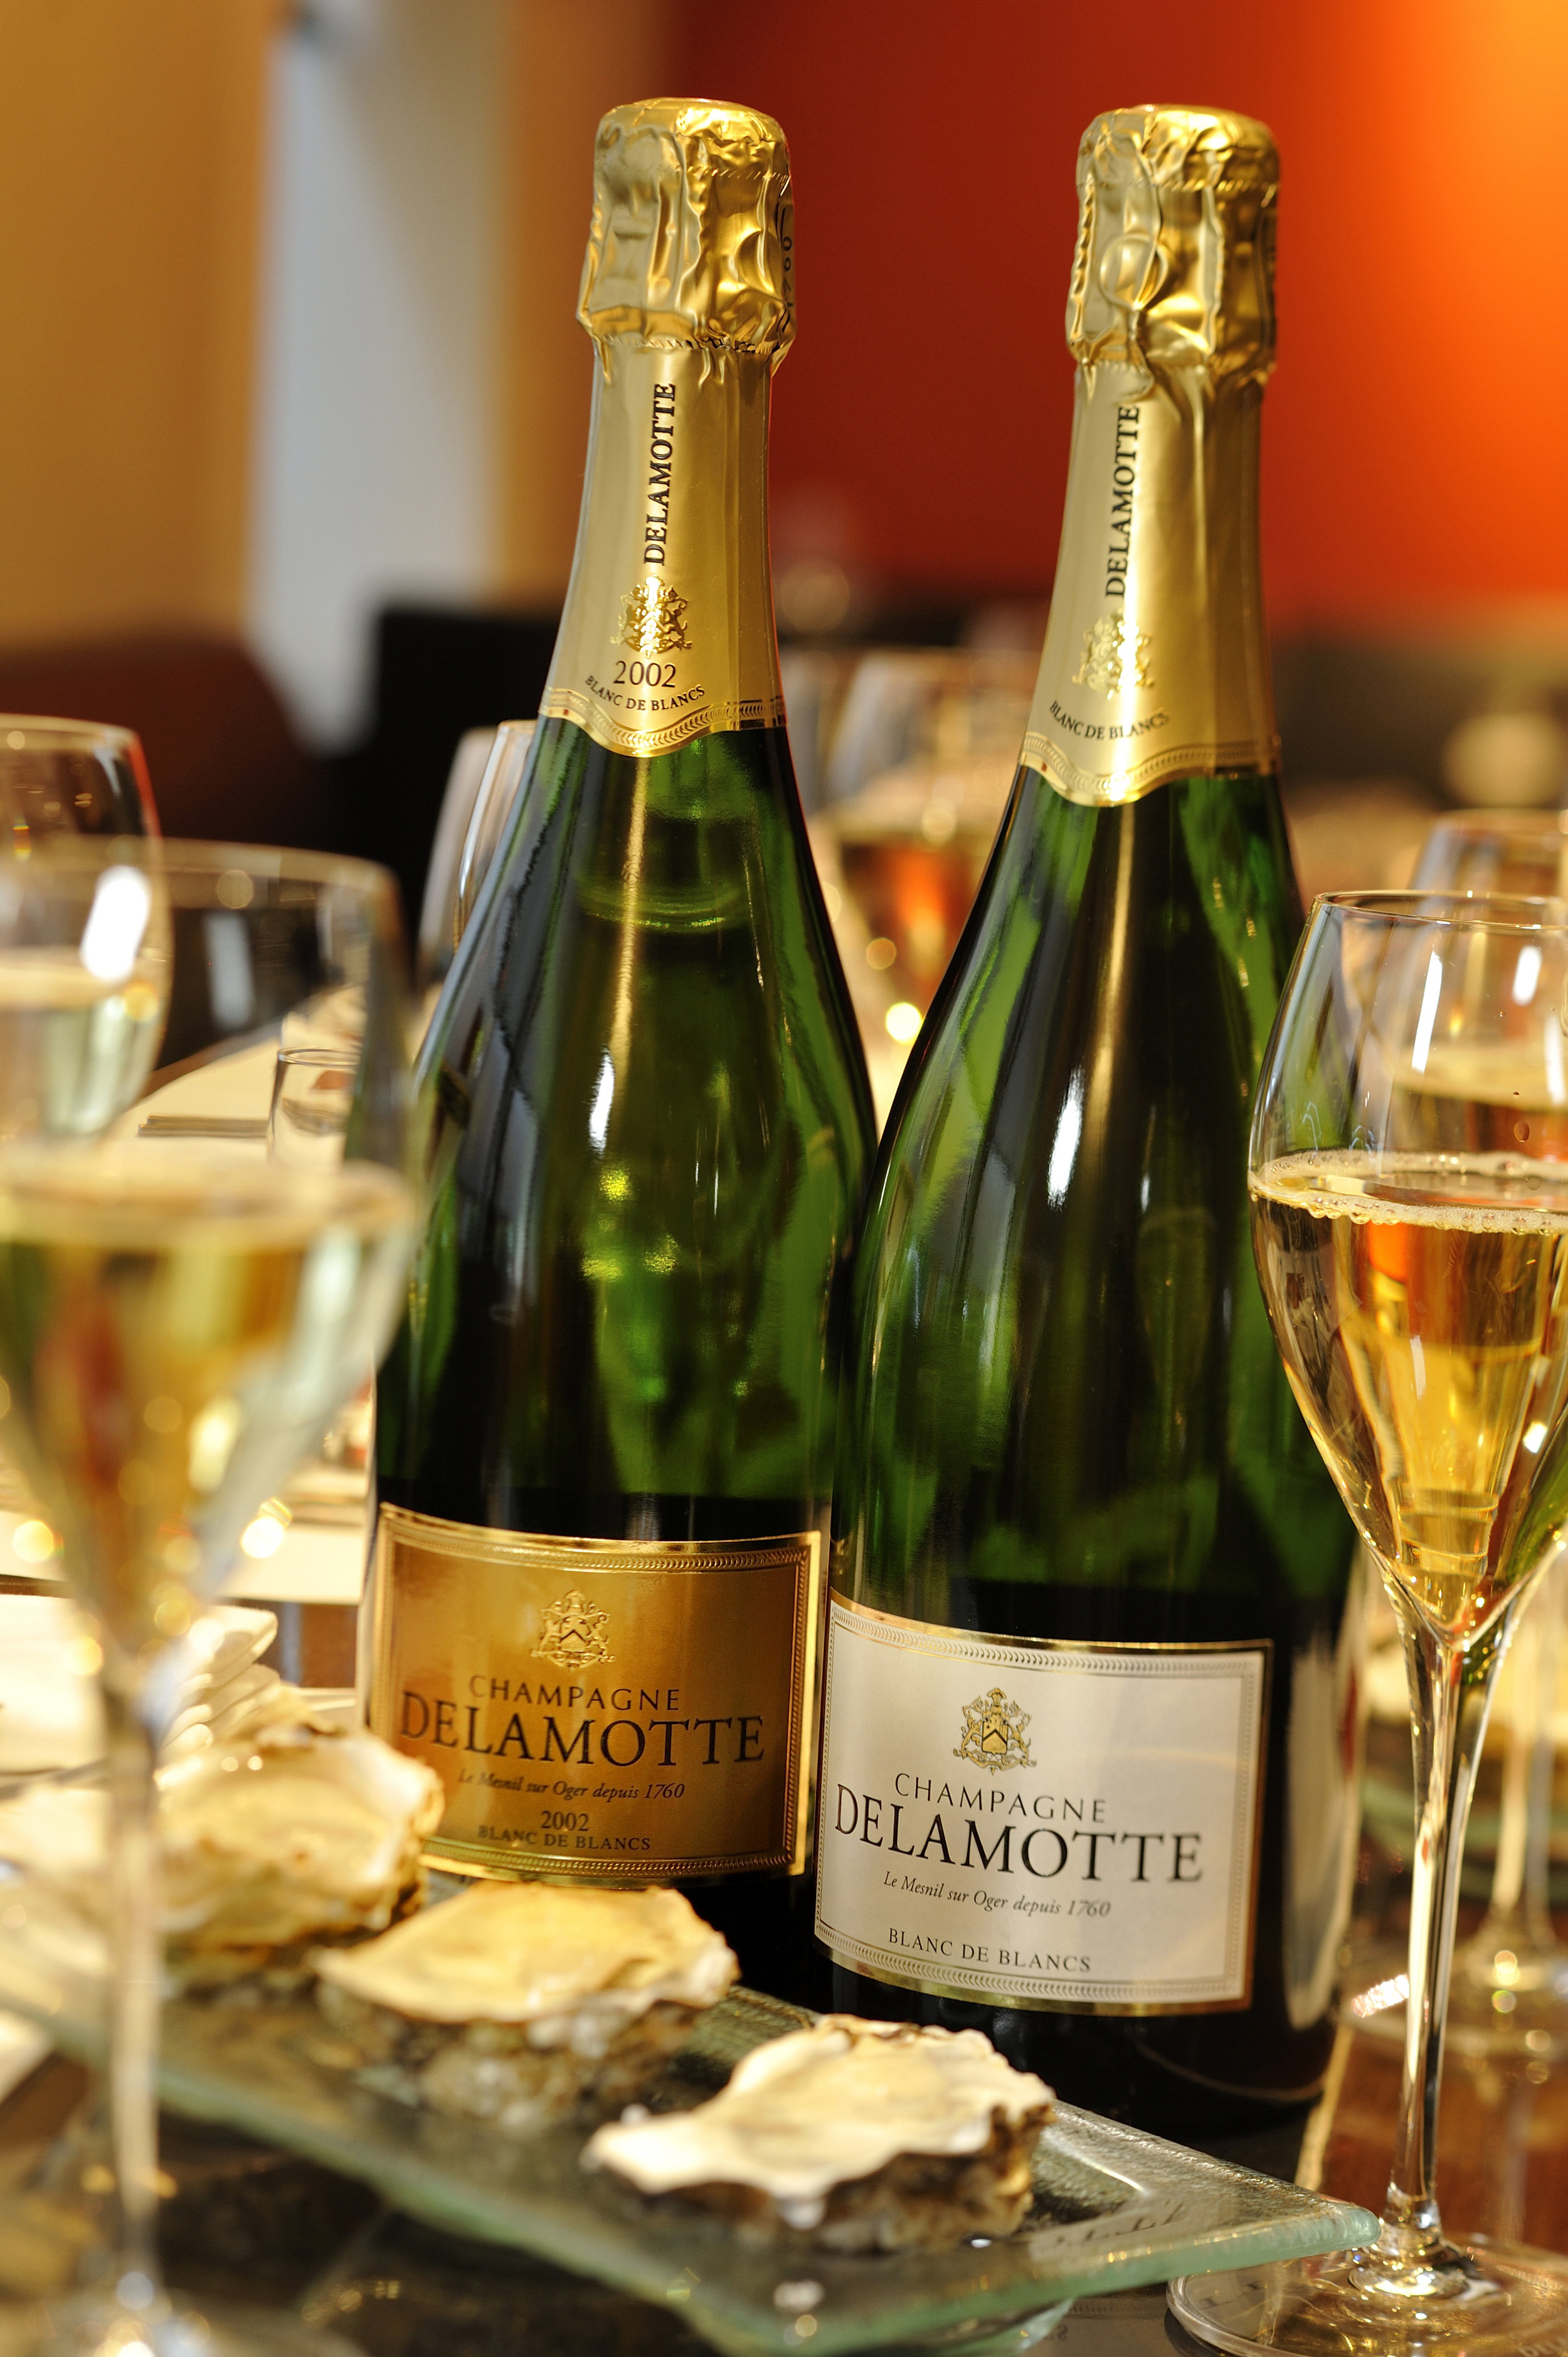 courtesy Champagne Delamotte